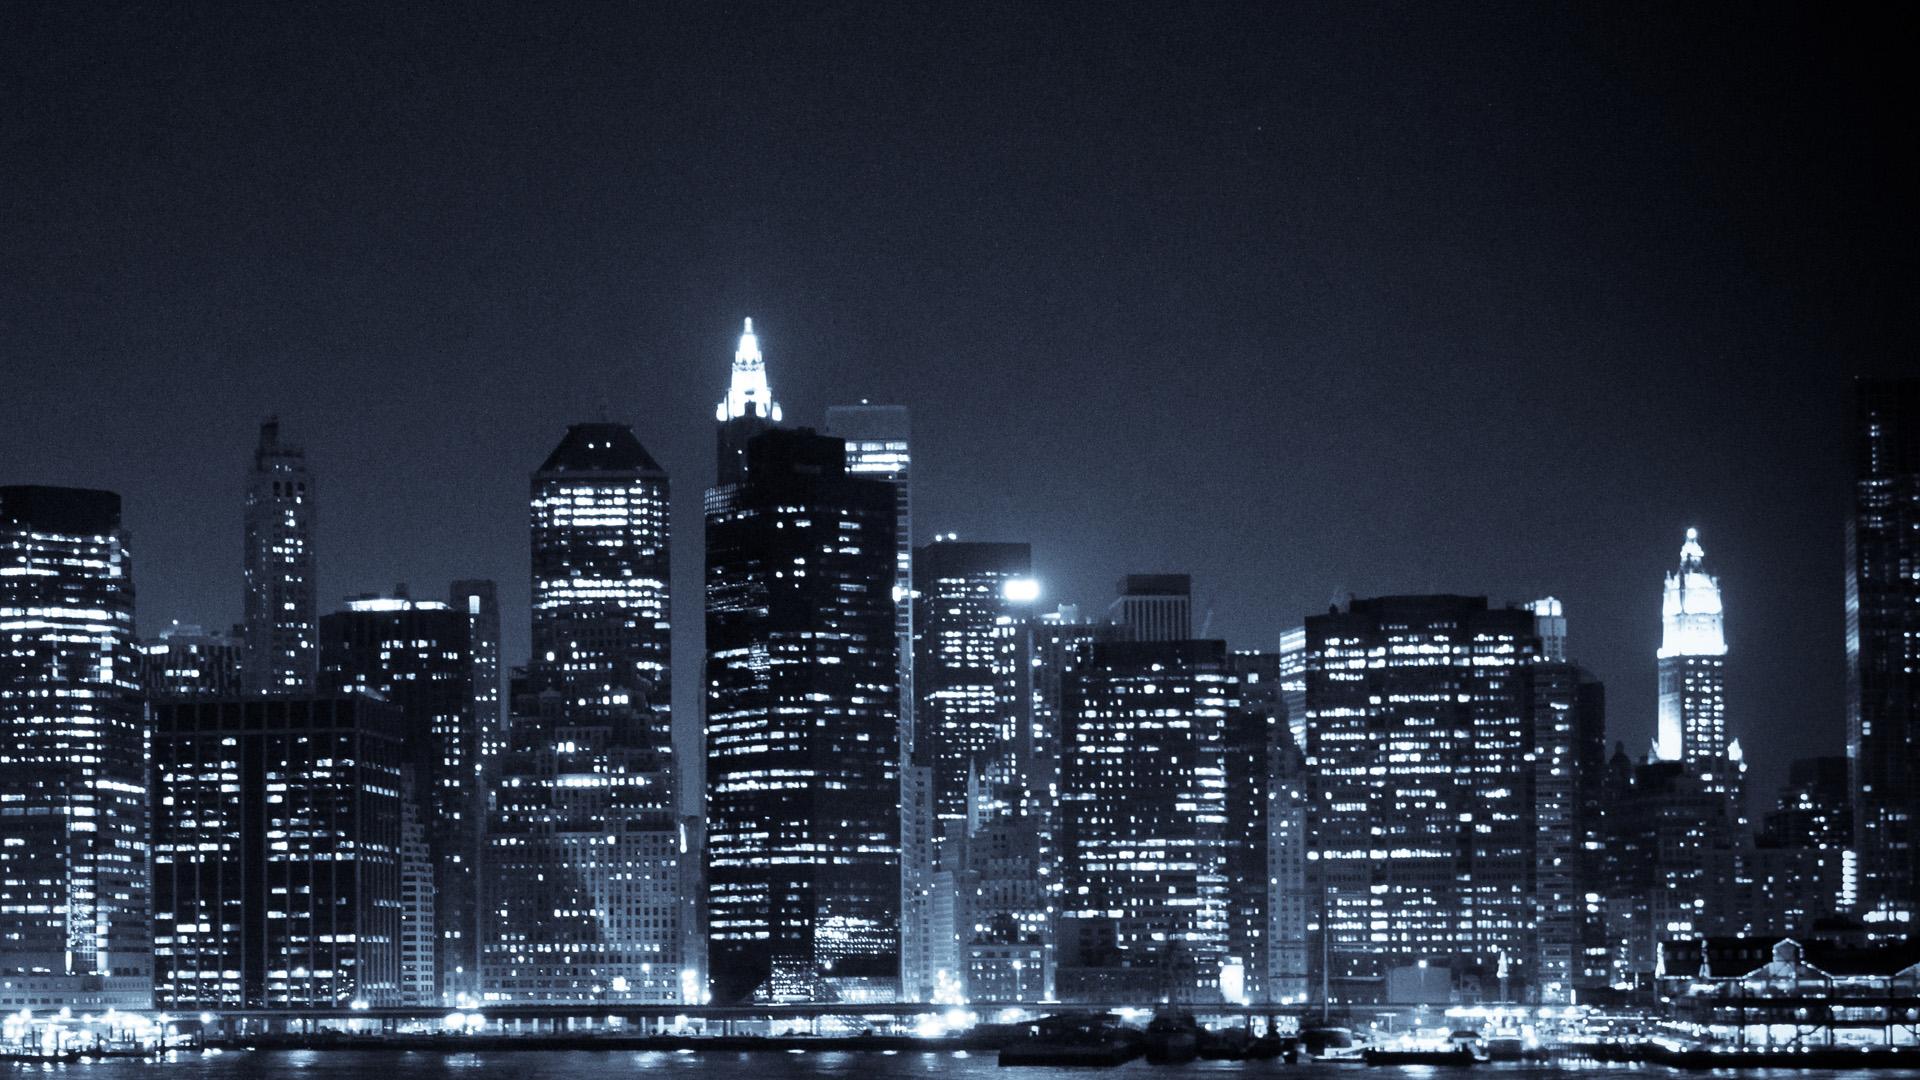 Manhattan skyline hd wallpaper wallpapersafari - Skyline night wallpaper ...